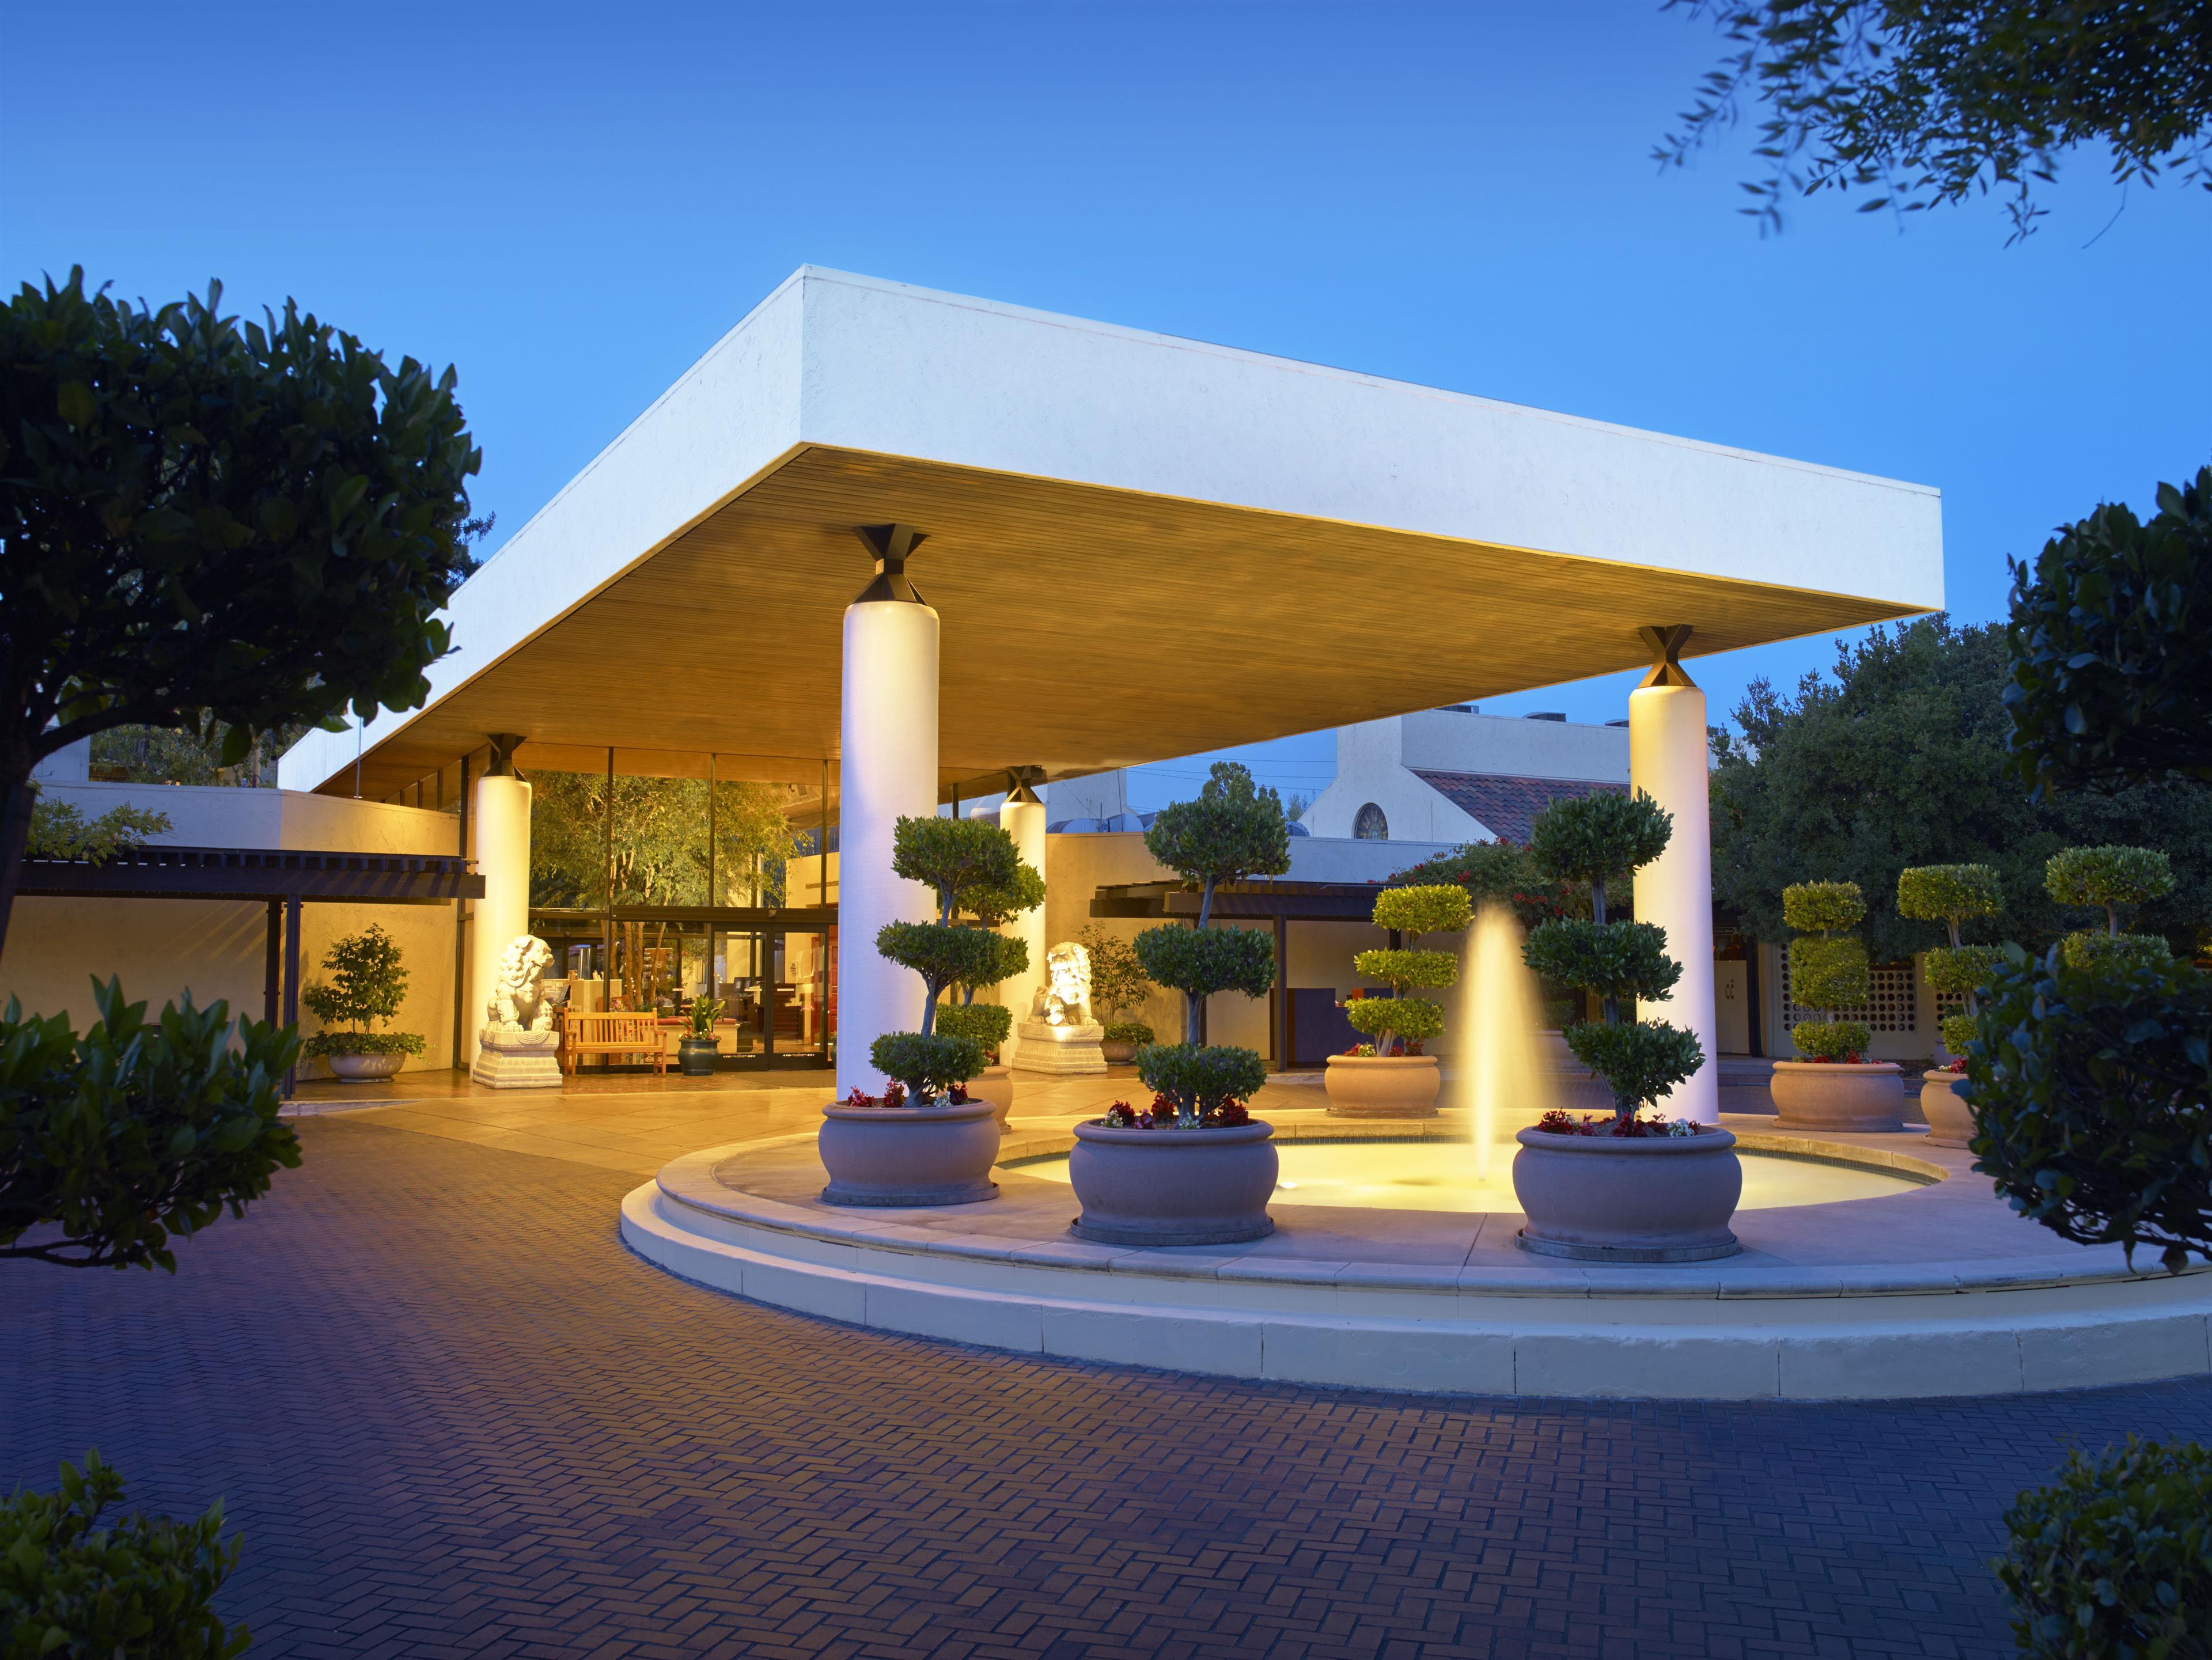 Sheraton Palo Alto Hotel image 0